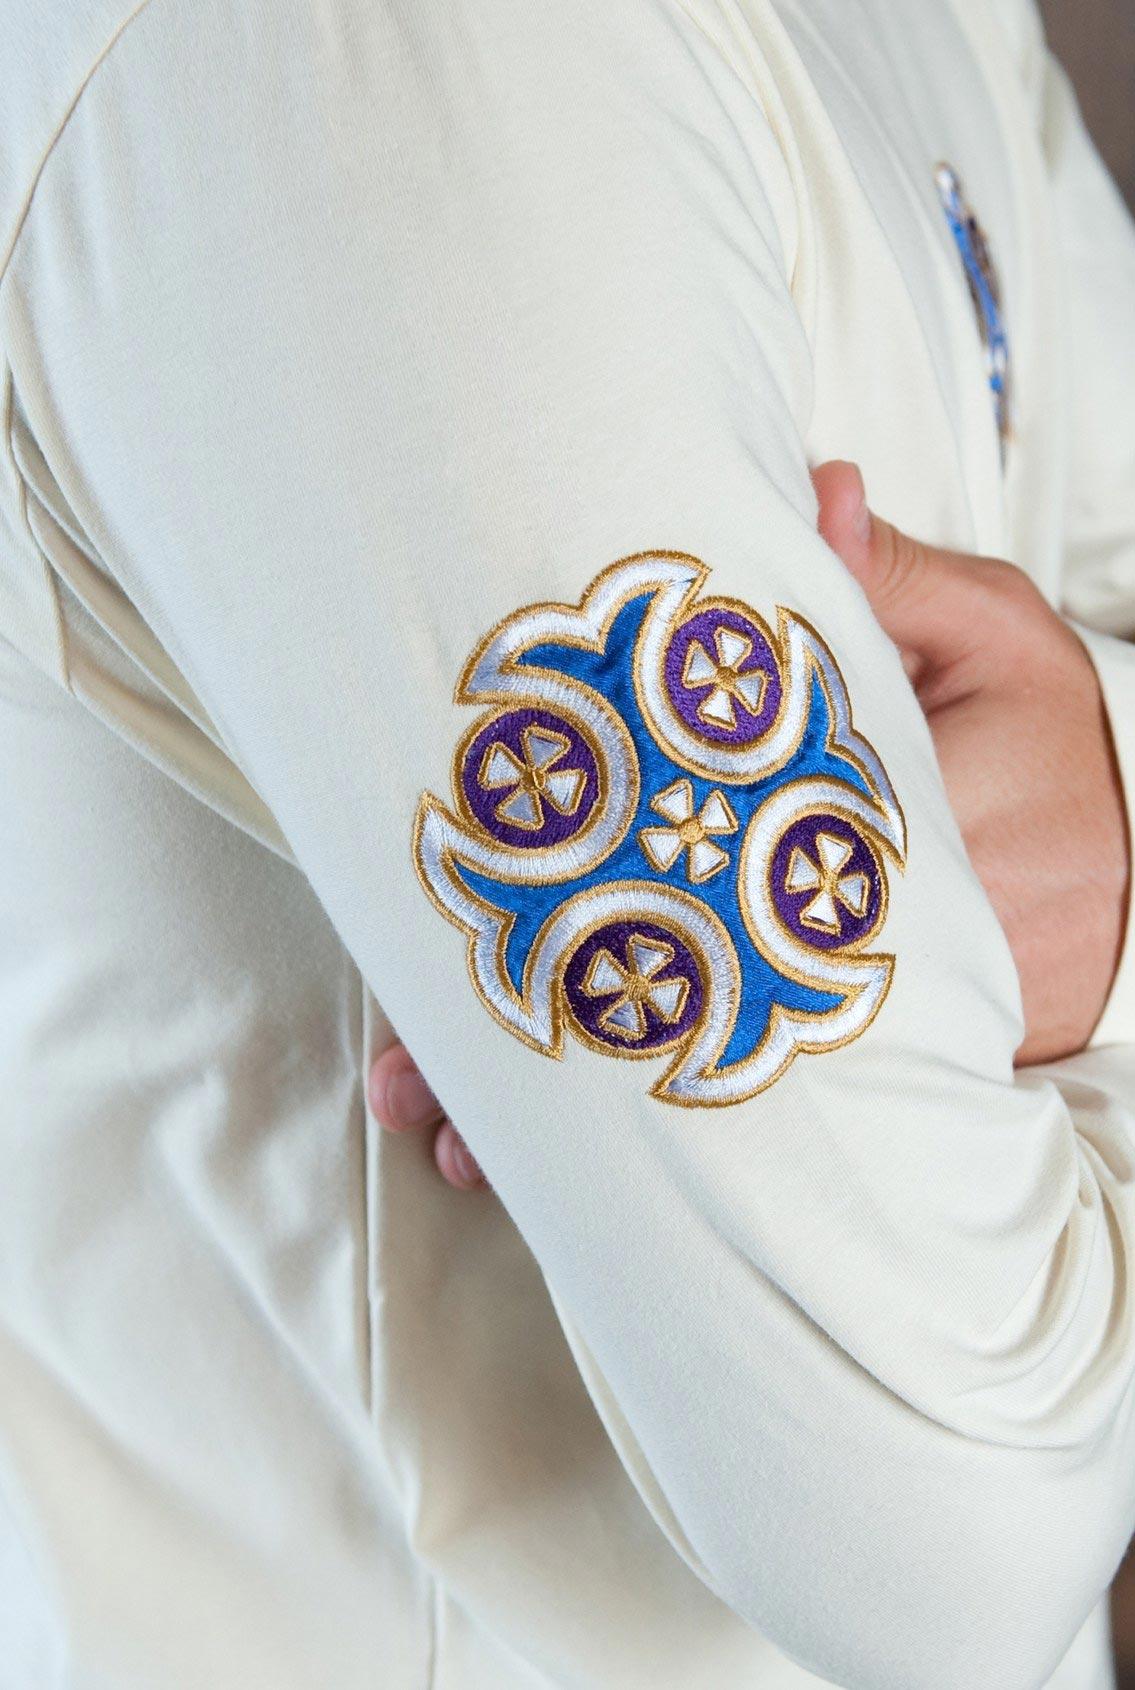 футболка с крестом, t-shirt with cross